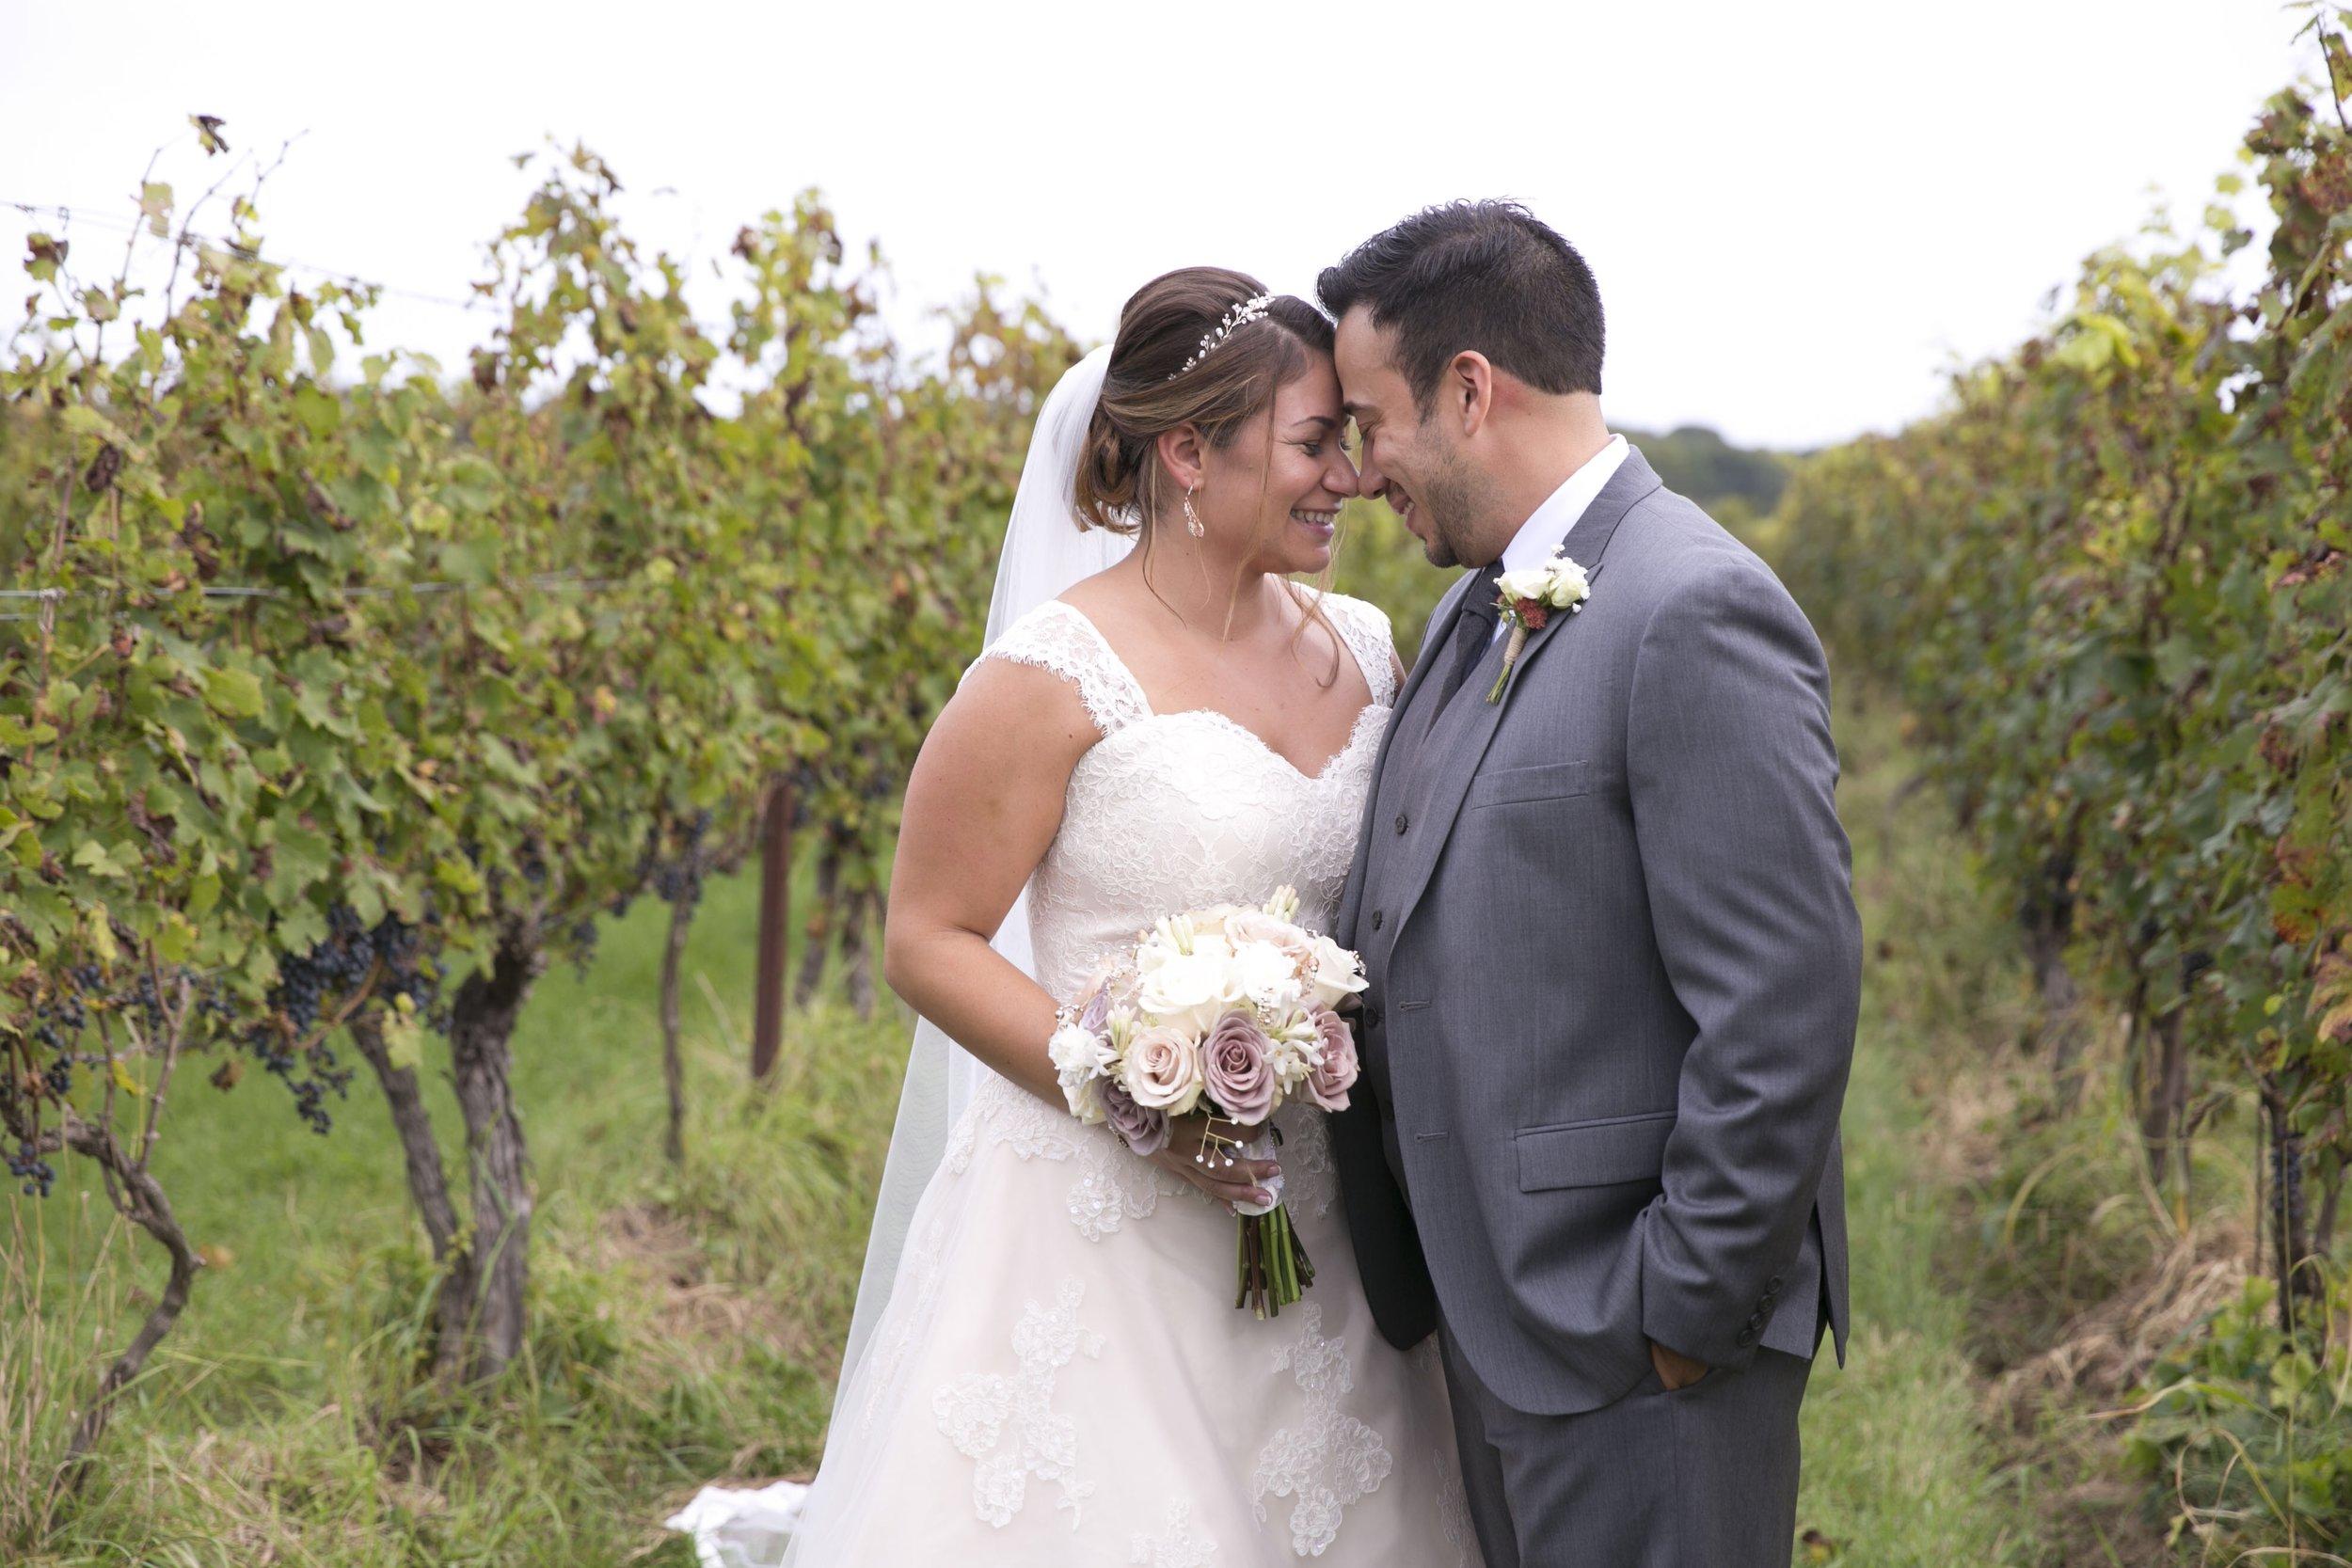 Natalie & Steve, October 7, 2017